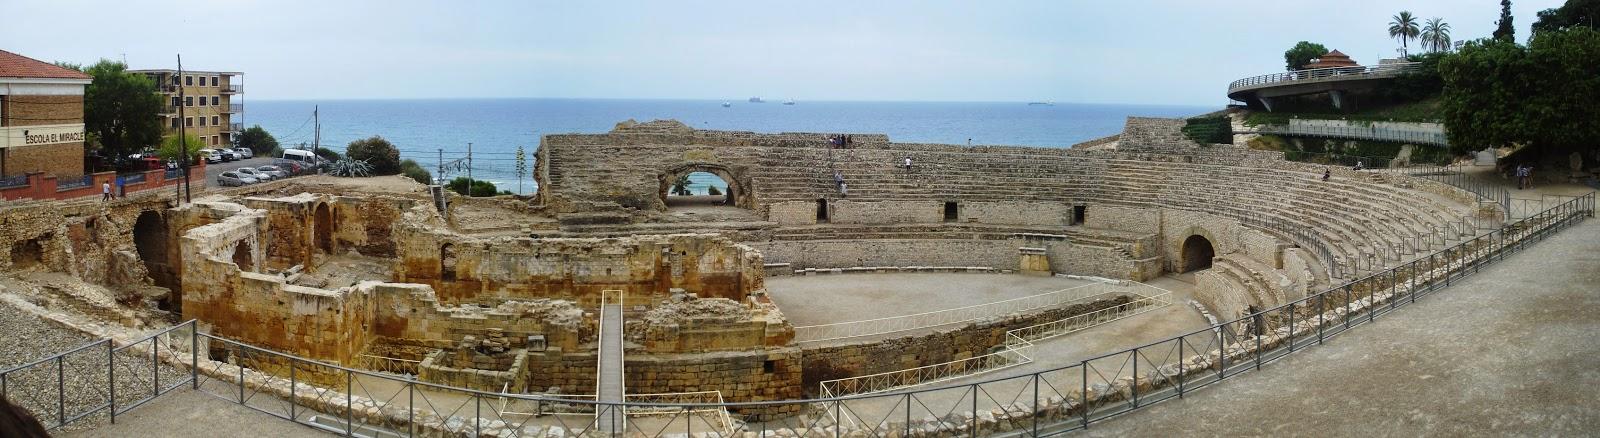 https://sites.google.com/site/australangel/Tarragona.swf?attredirects=0